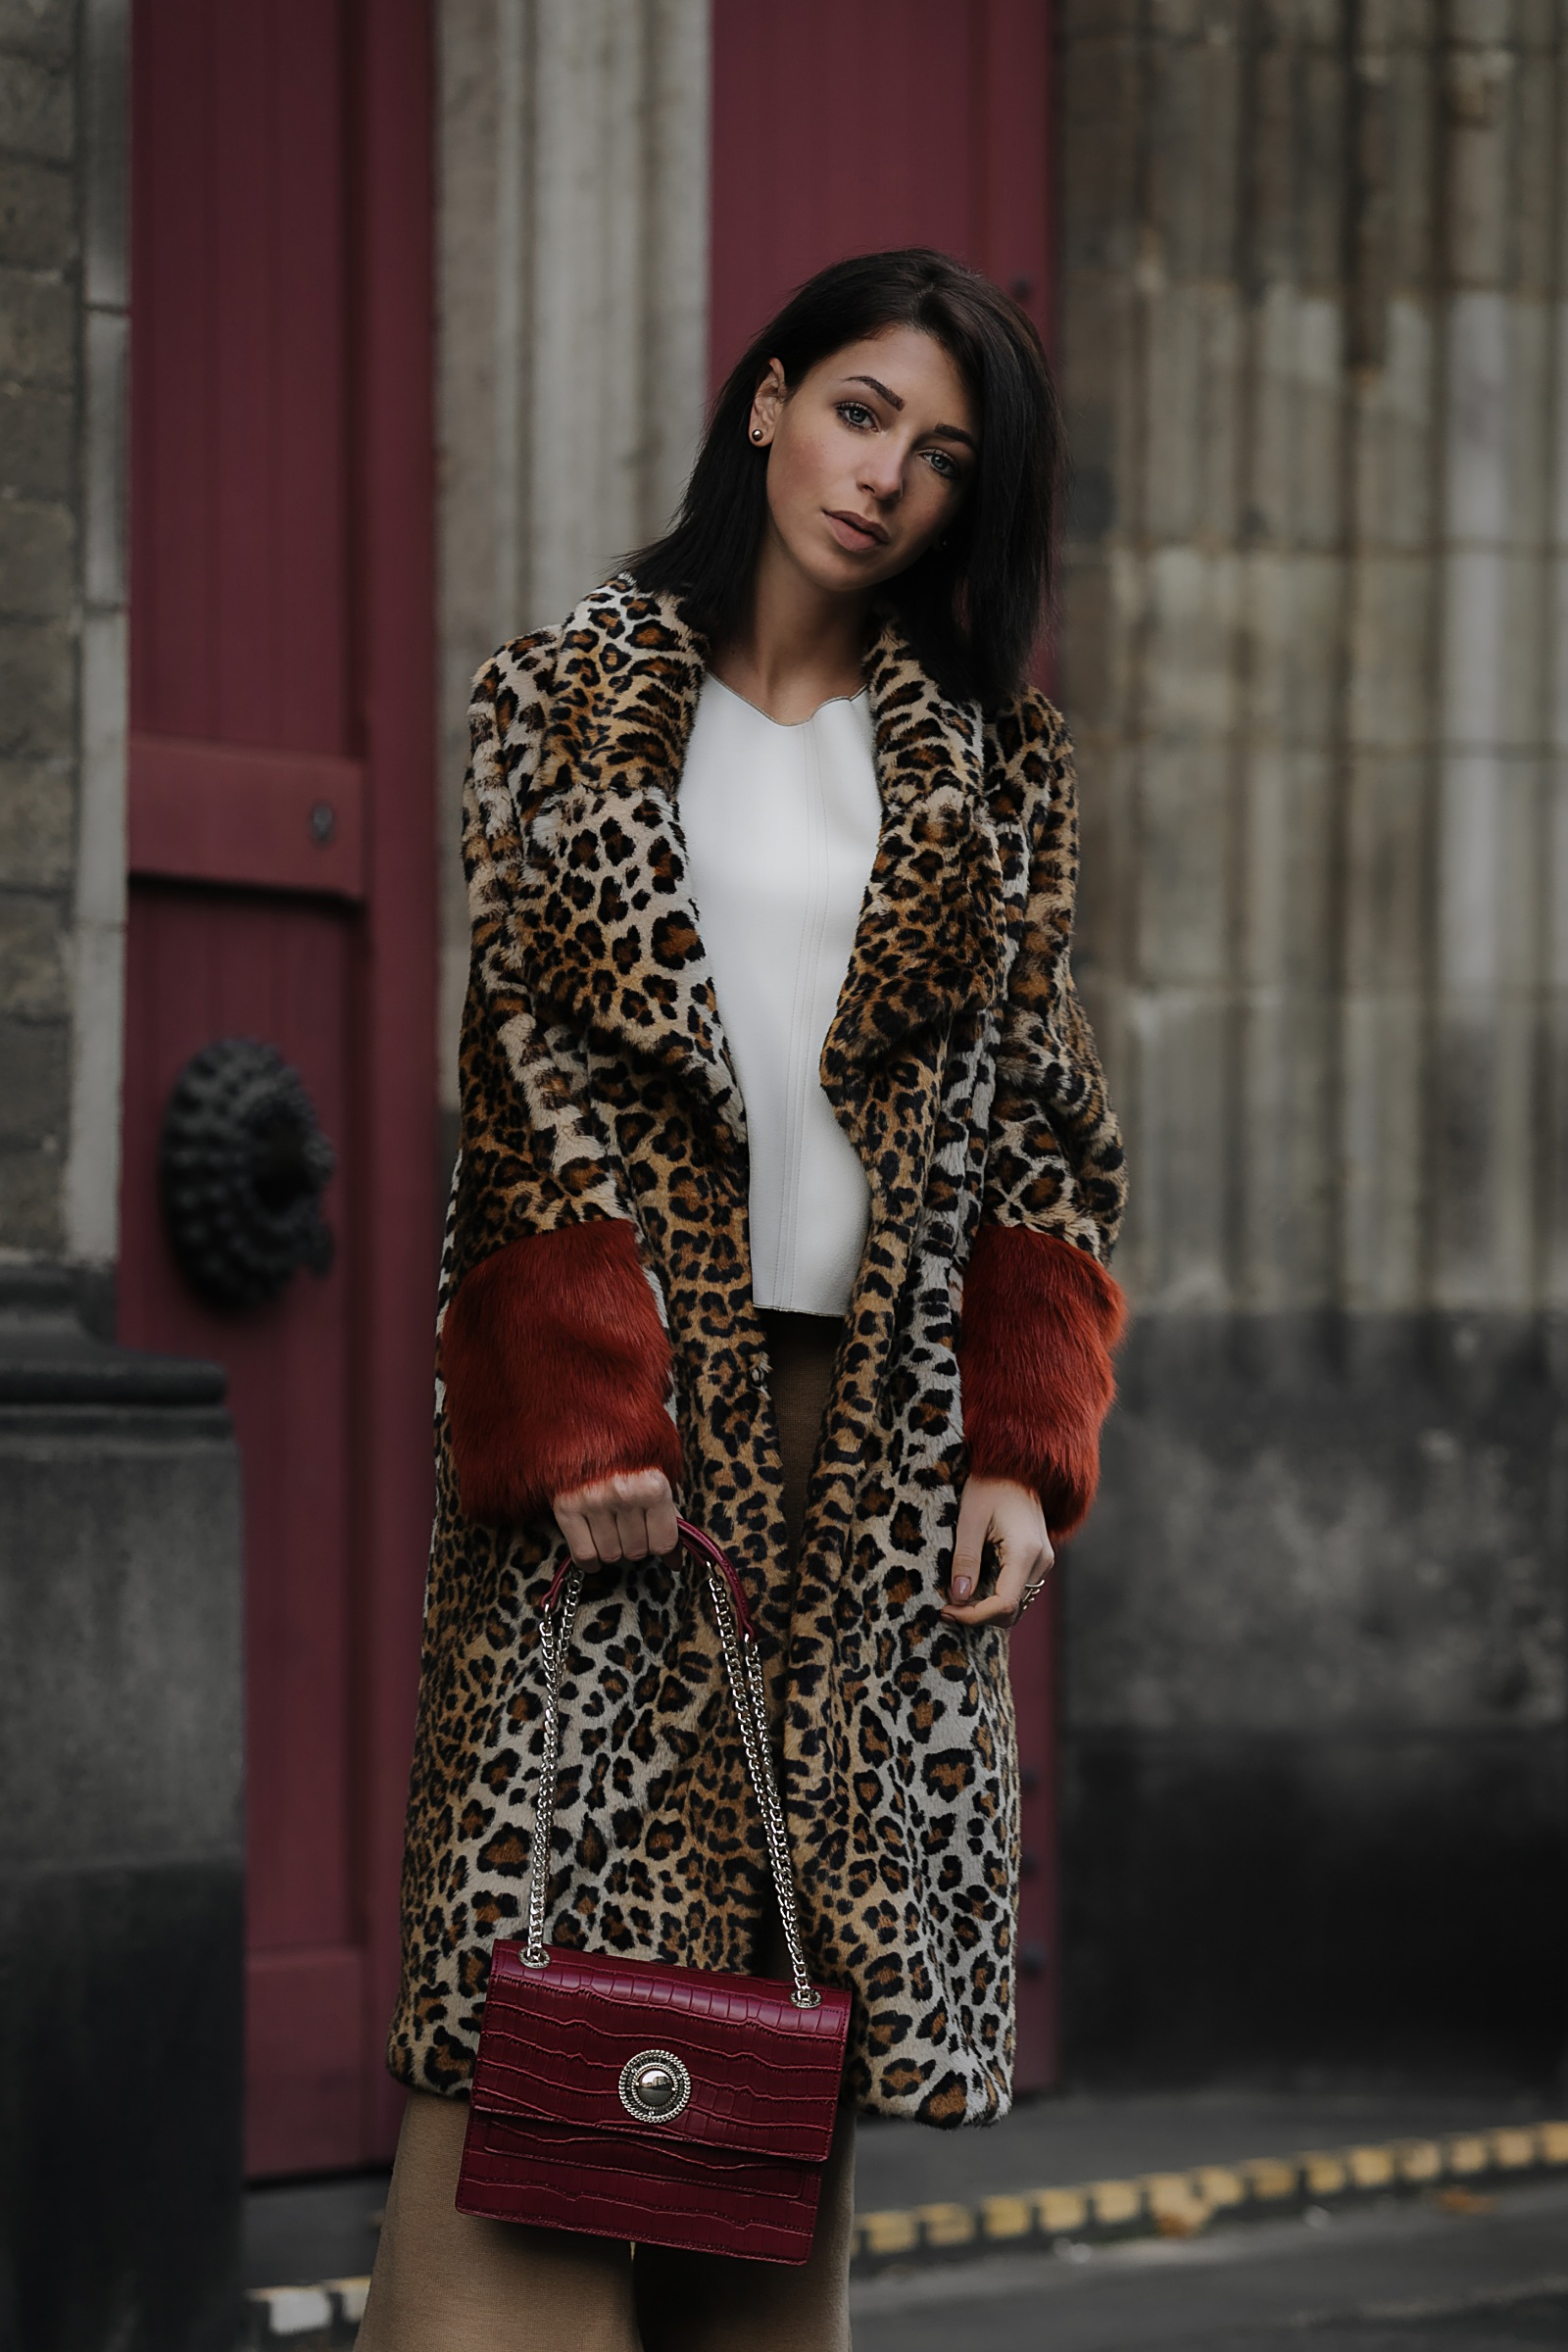 outfit-große-tolle-modeblogs-deutsch-high-fashion-blogger-jasmin-kessler-couture-de-coeur